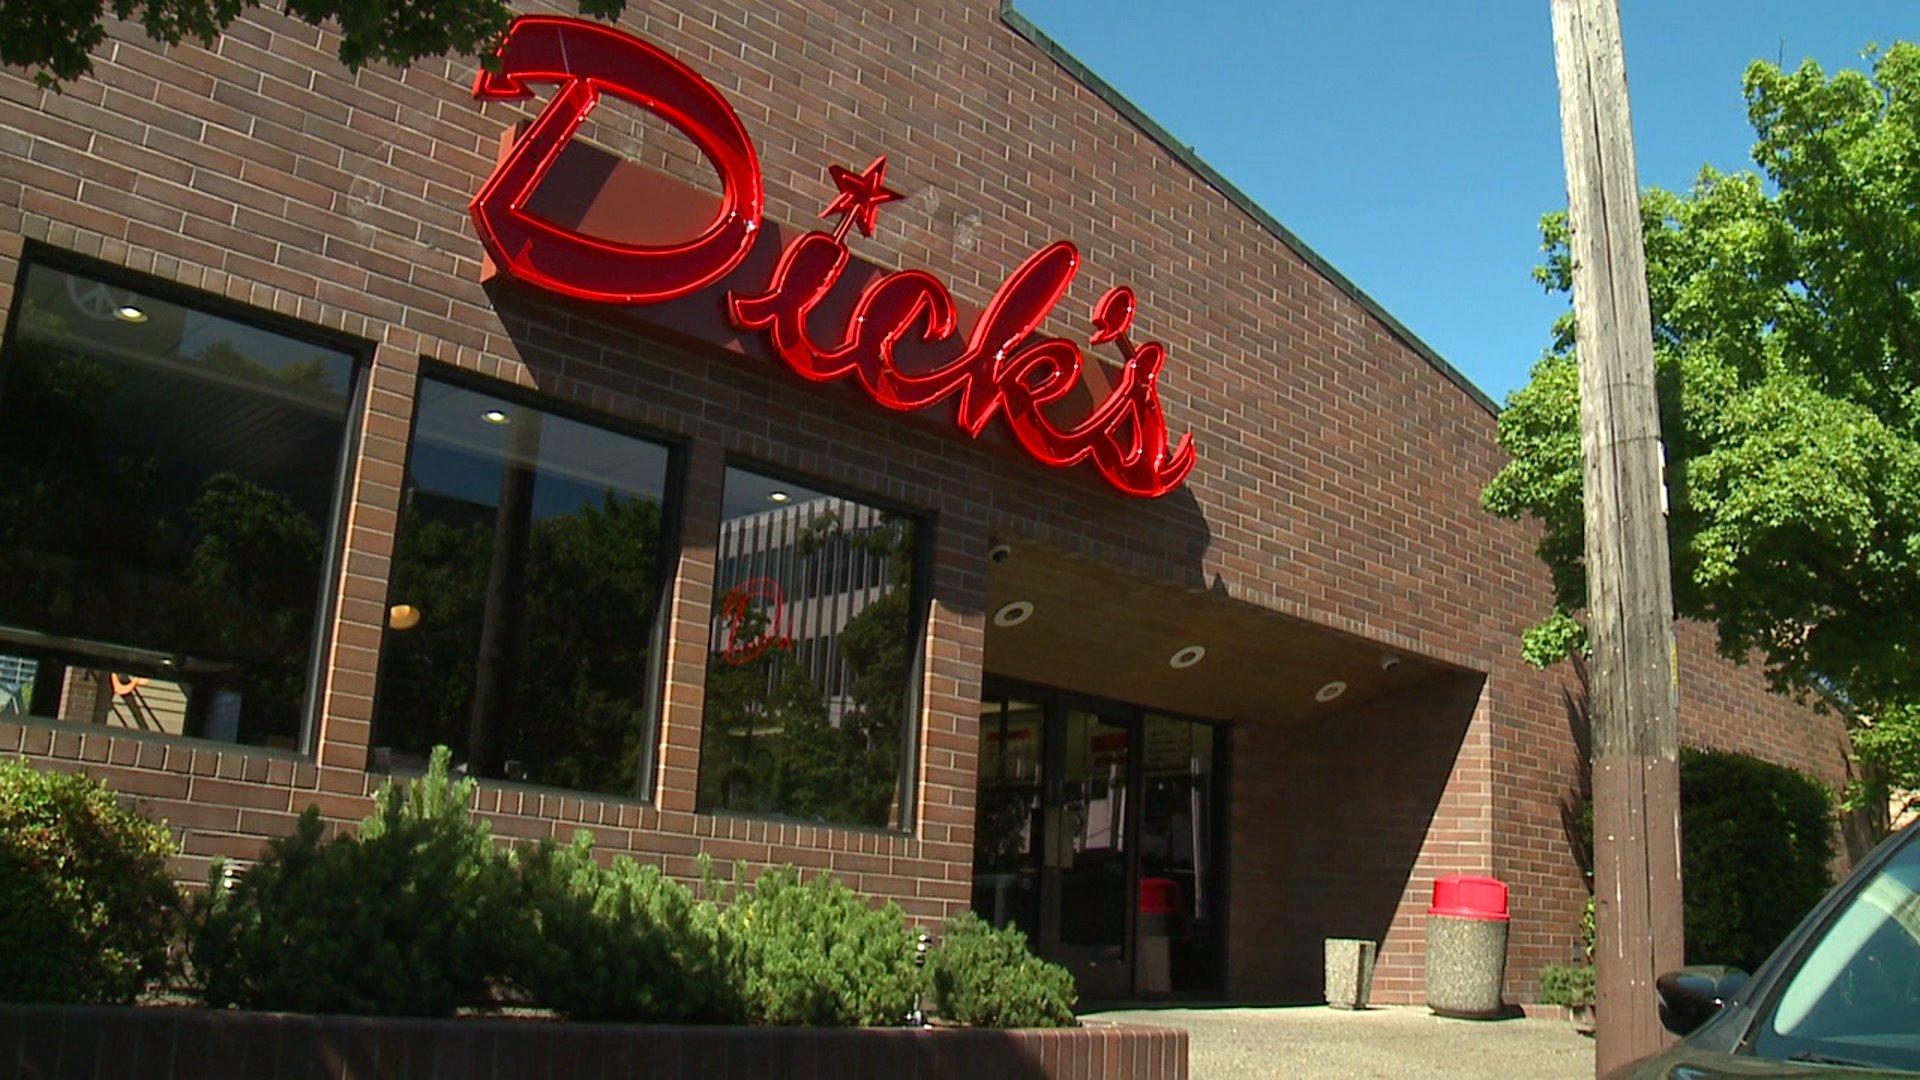 Man Stabbed to Death Outside of Popular Washington Restaurant